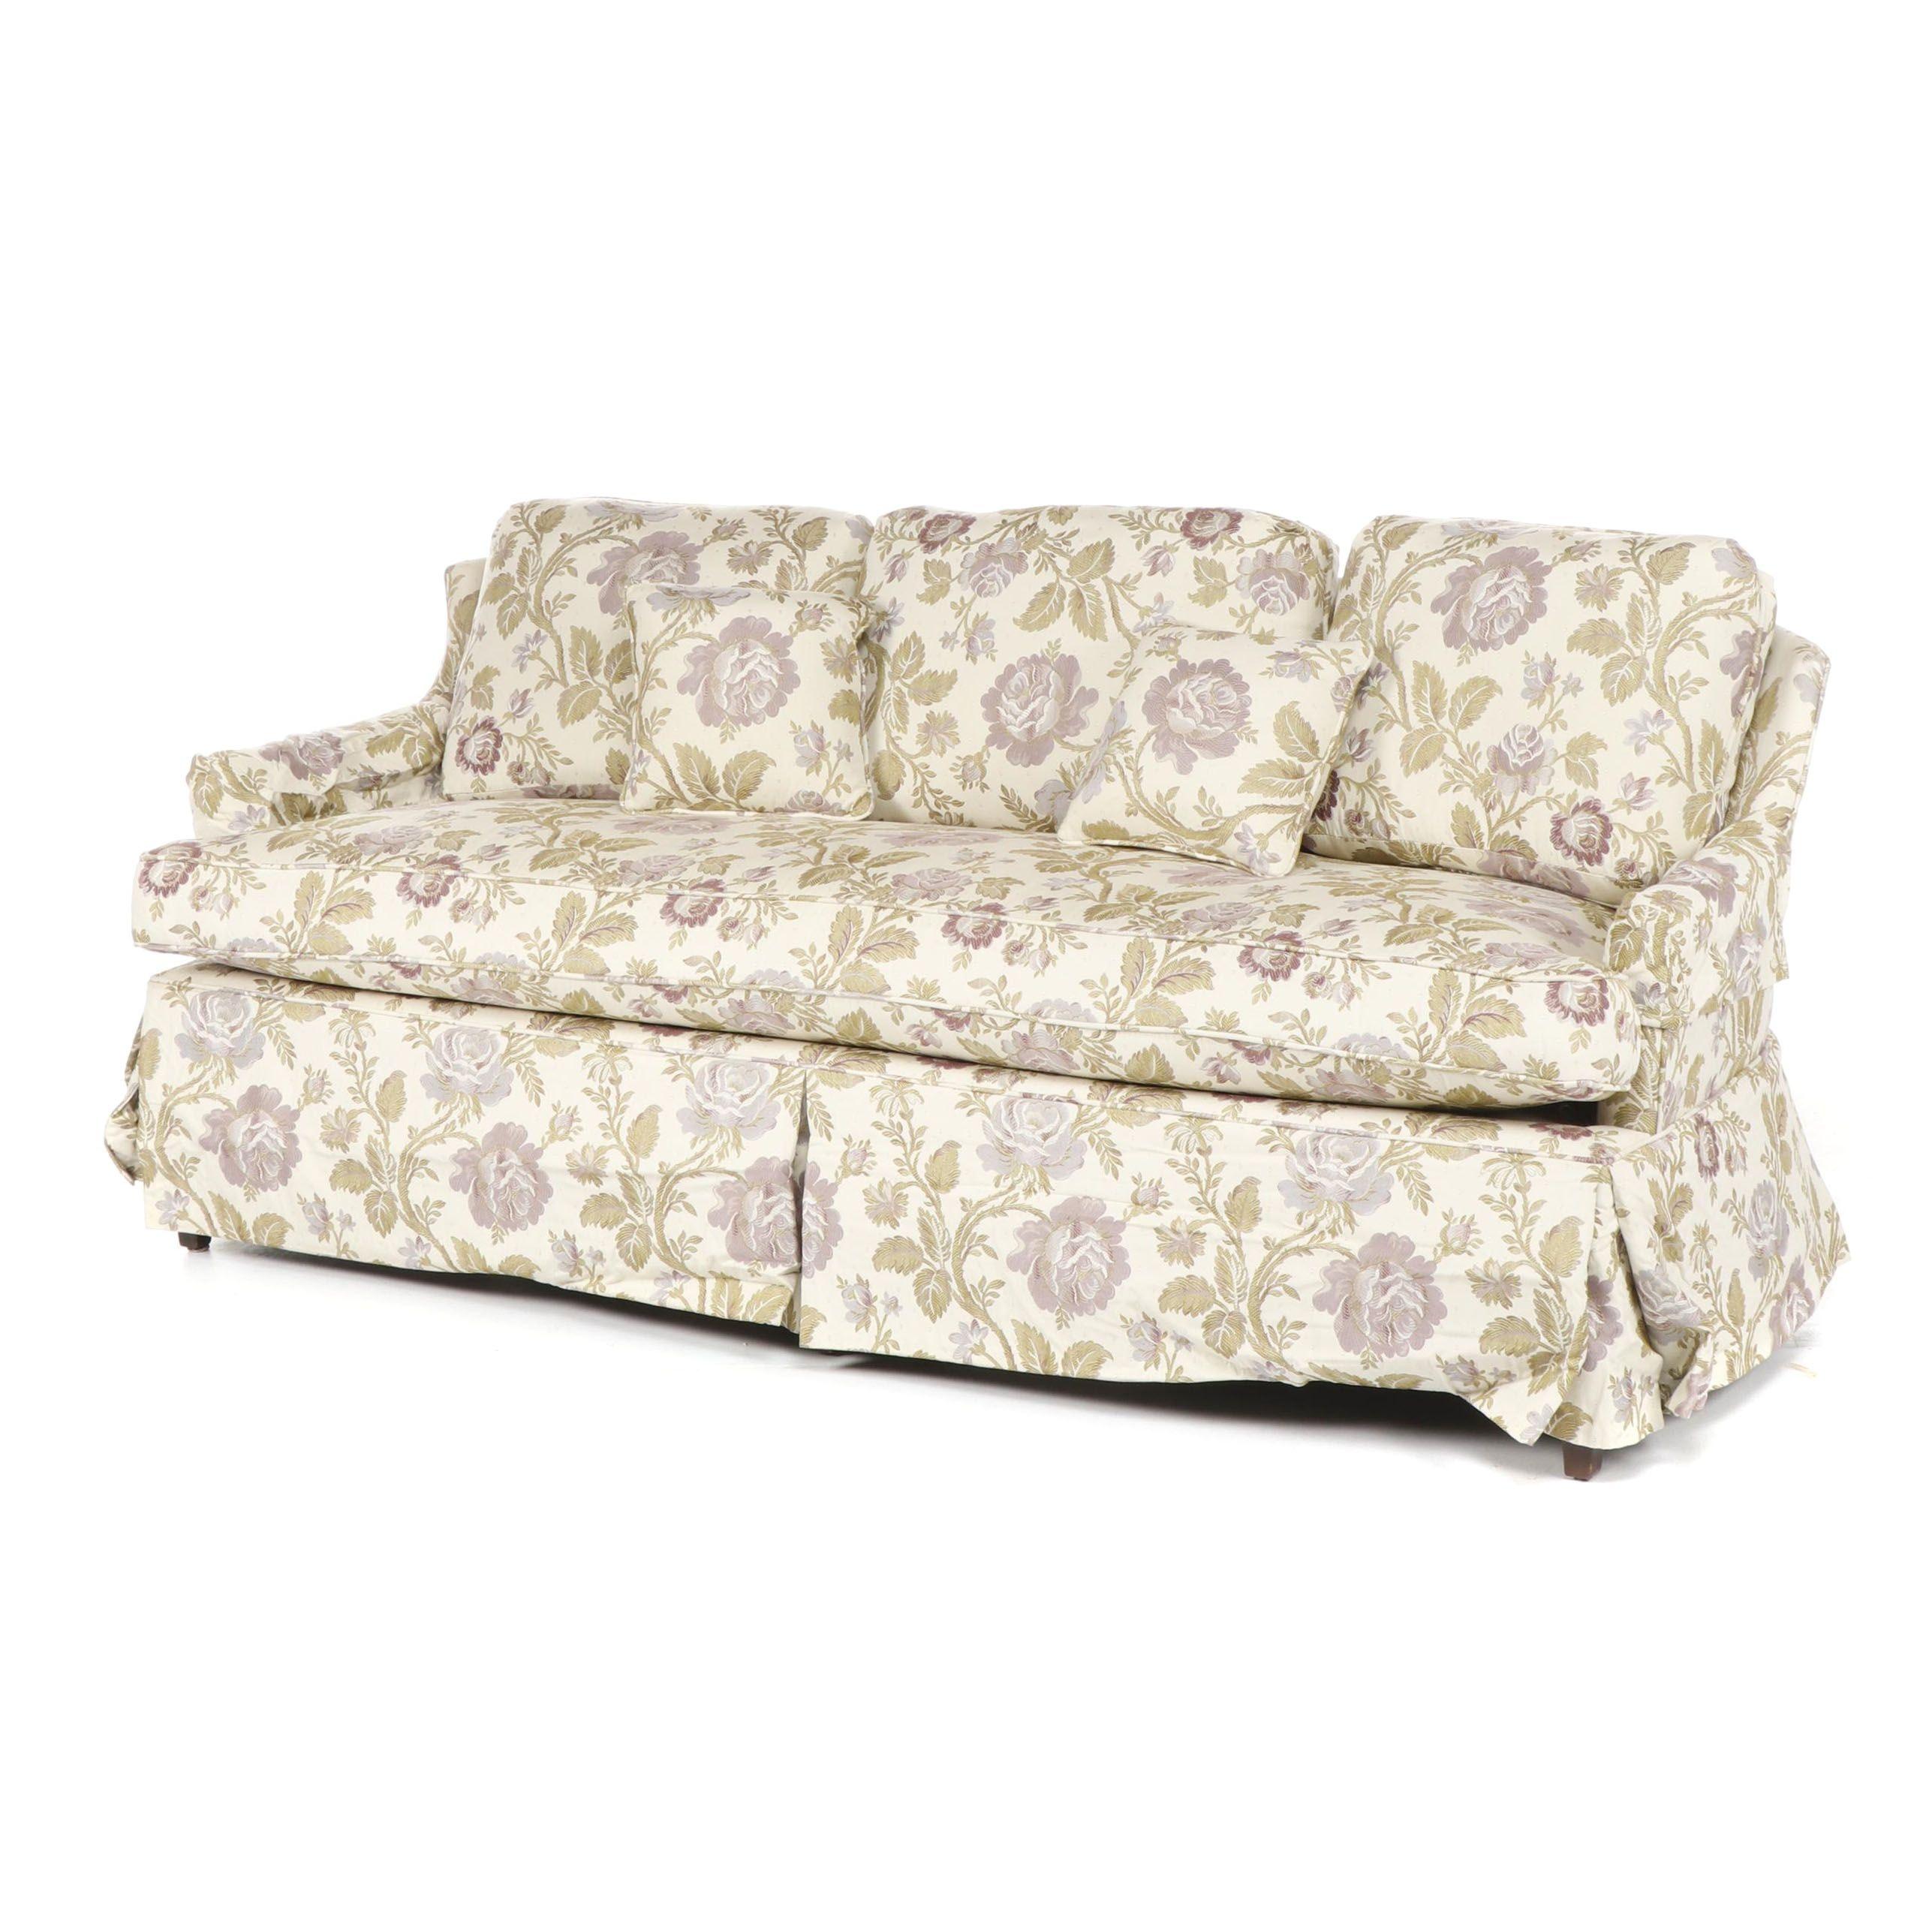 Floral Upholstered Sofa by Kirschner's Custom Upholstering, 21st Century